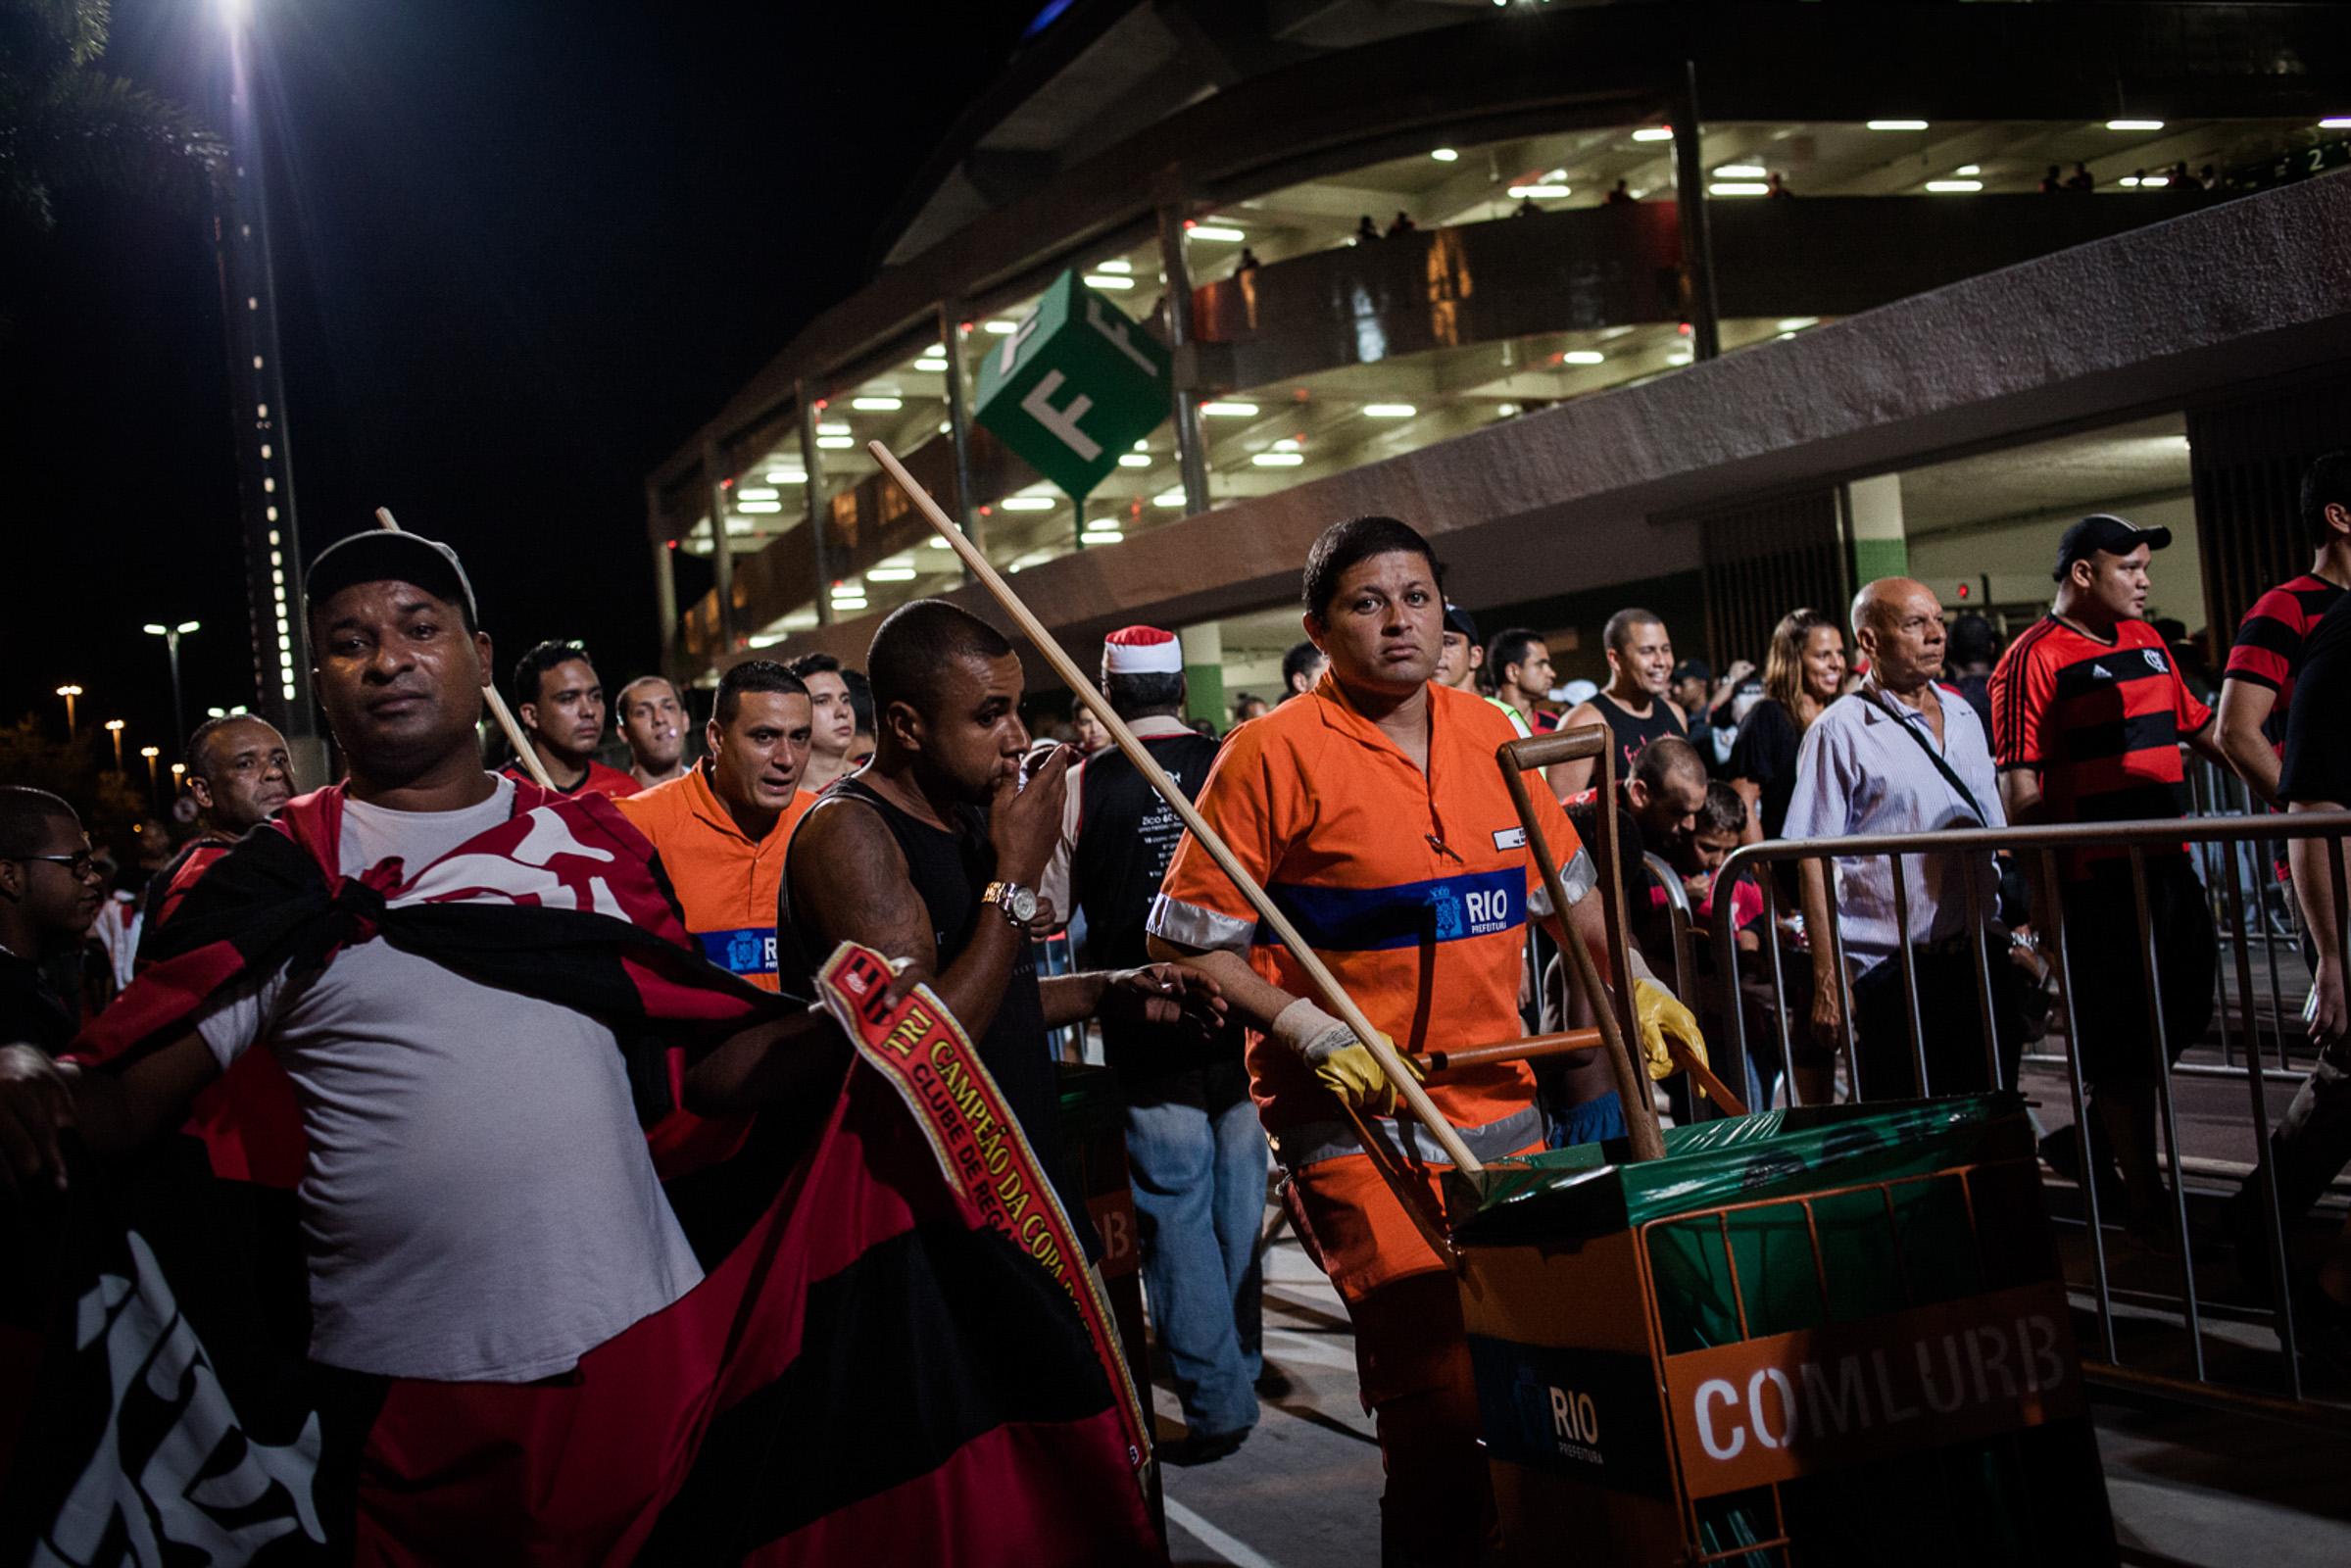 Rio de Janeiro, le 28 Novembre 2013. Garis autour du stade mythique de la Maracana, un jour de match.  Rio de Janeiro, November 28, 2013. Garis (sweepers) around the legendary Maracana stadium in a match day.